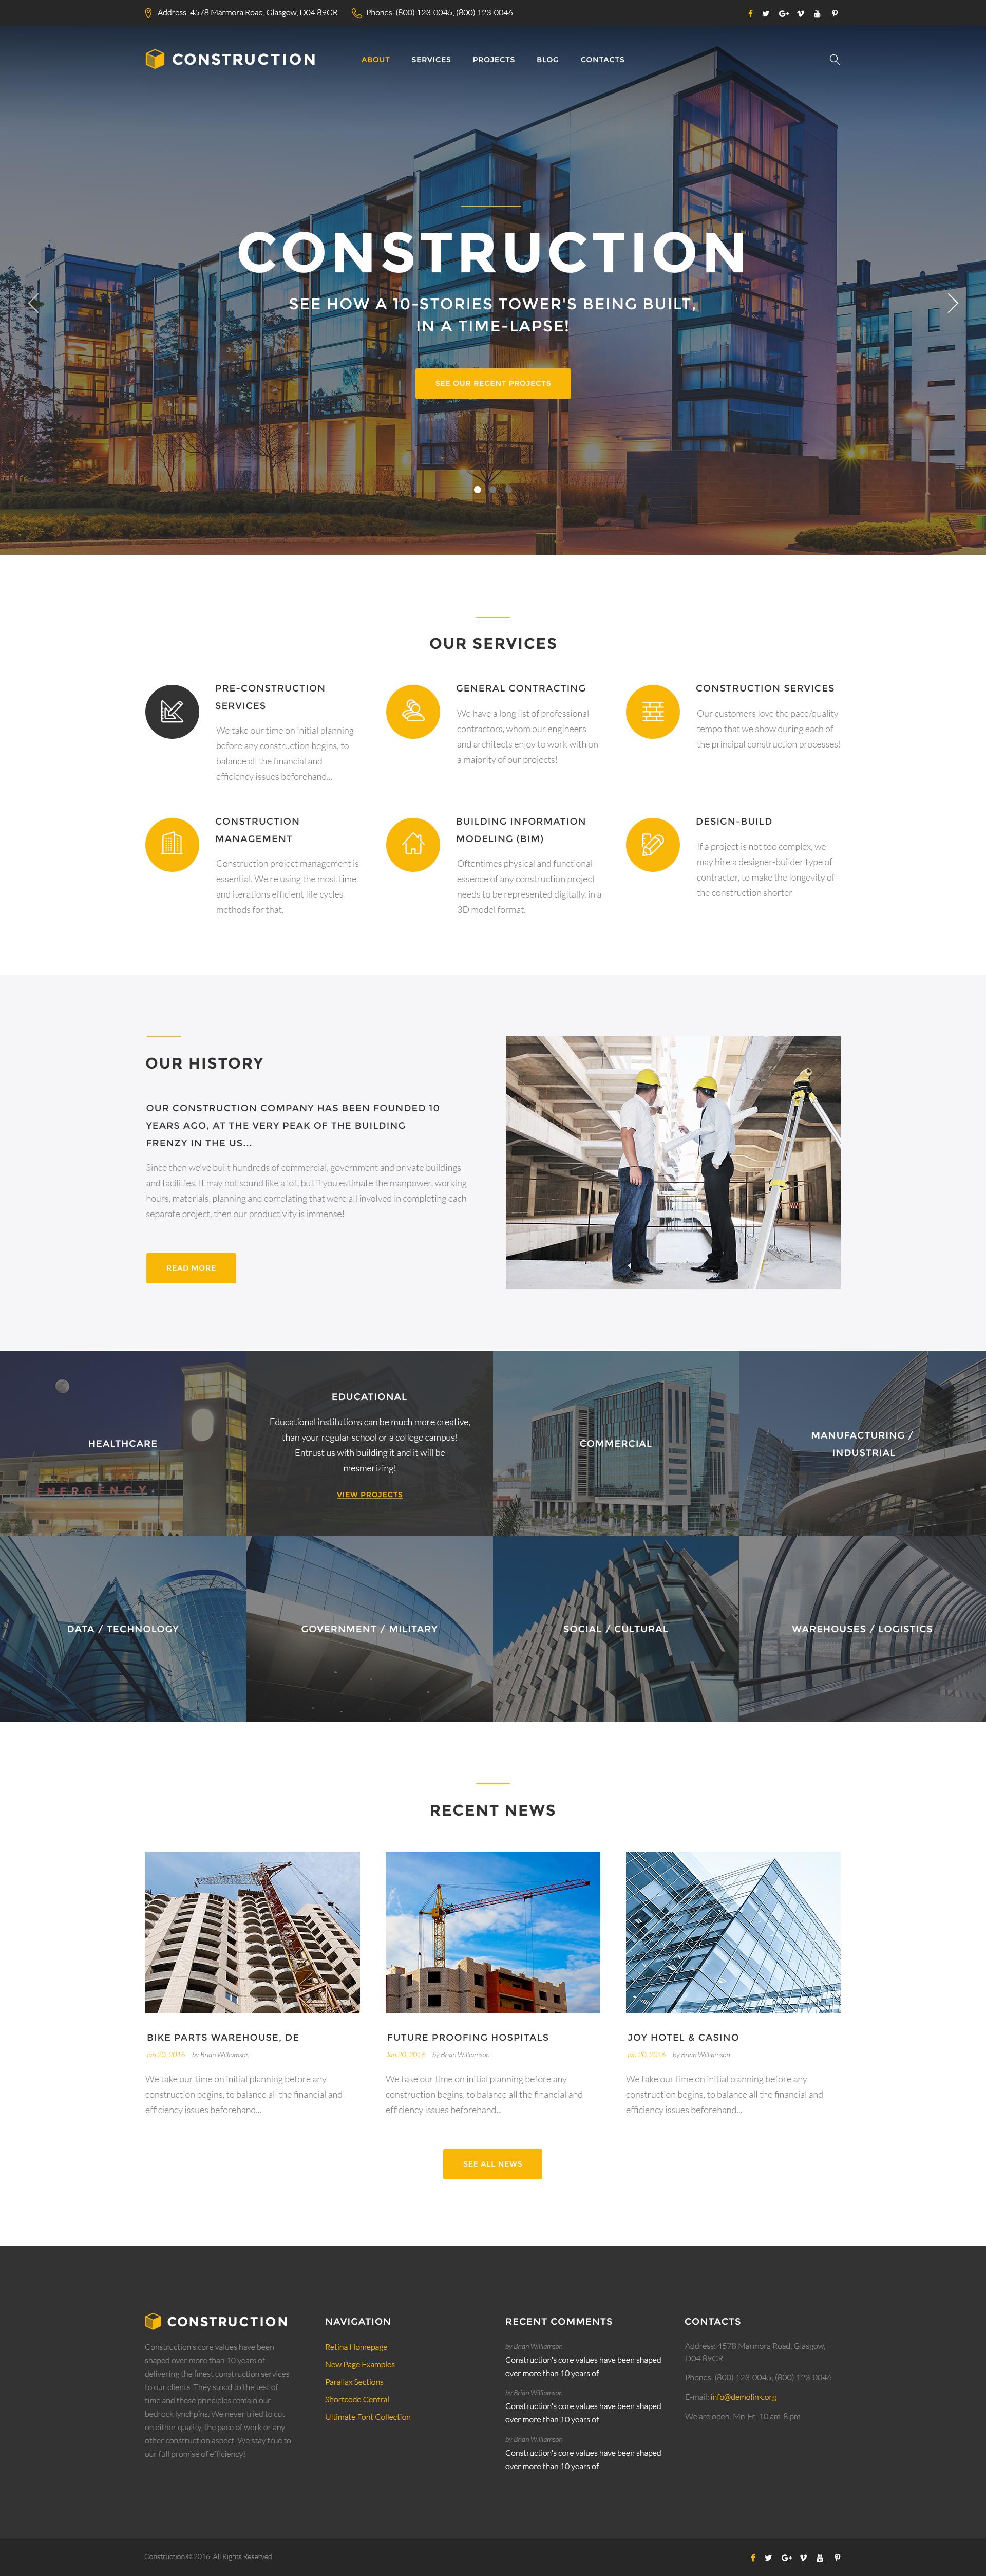 """Construction - Construction Company Responsive Multipage"" - адаптивний Шаблон сайту №62269"